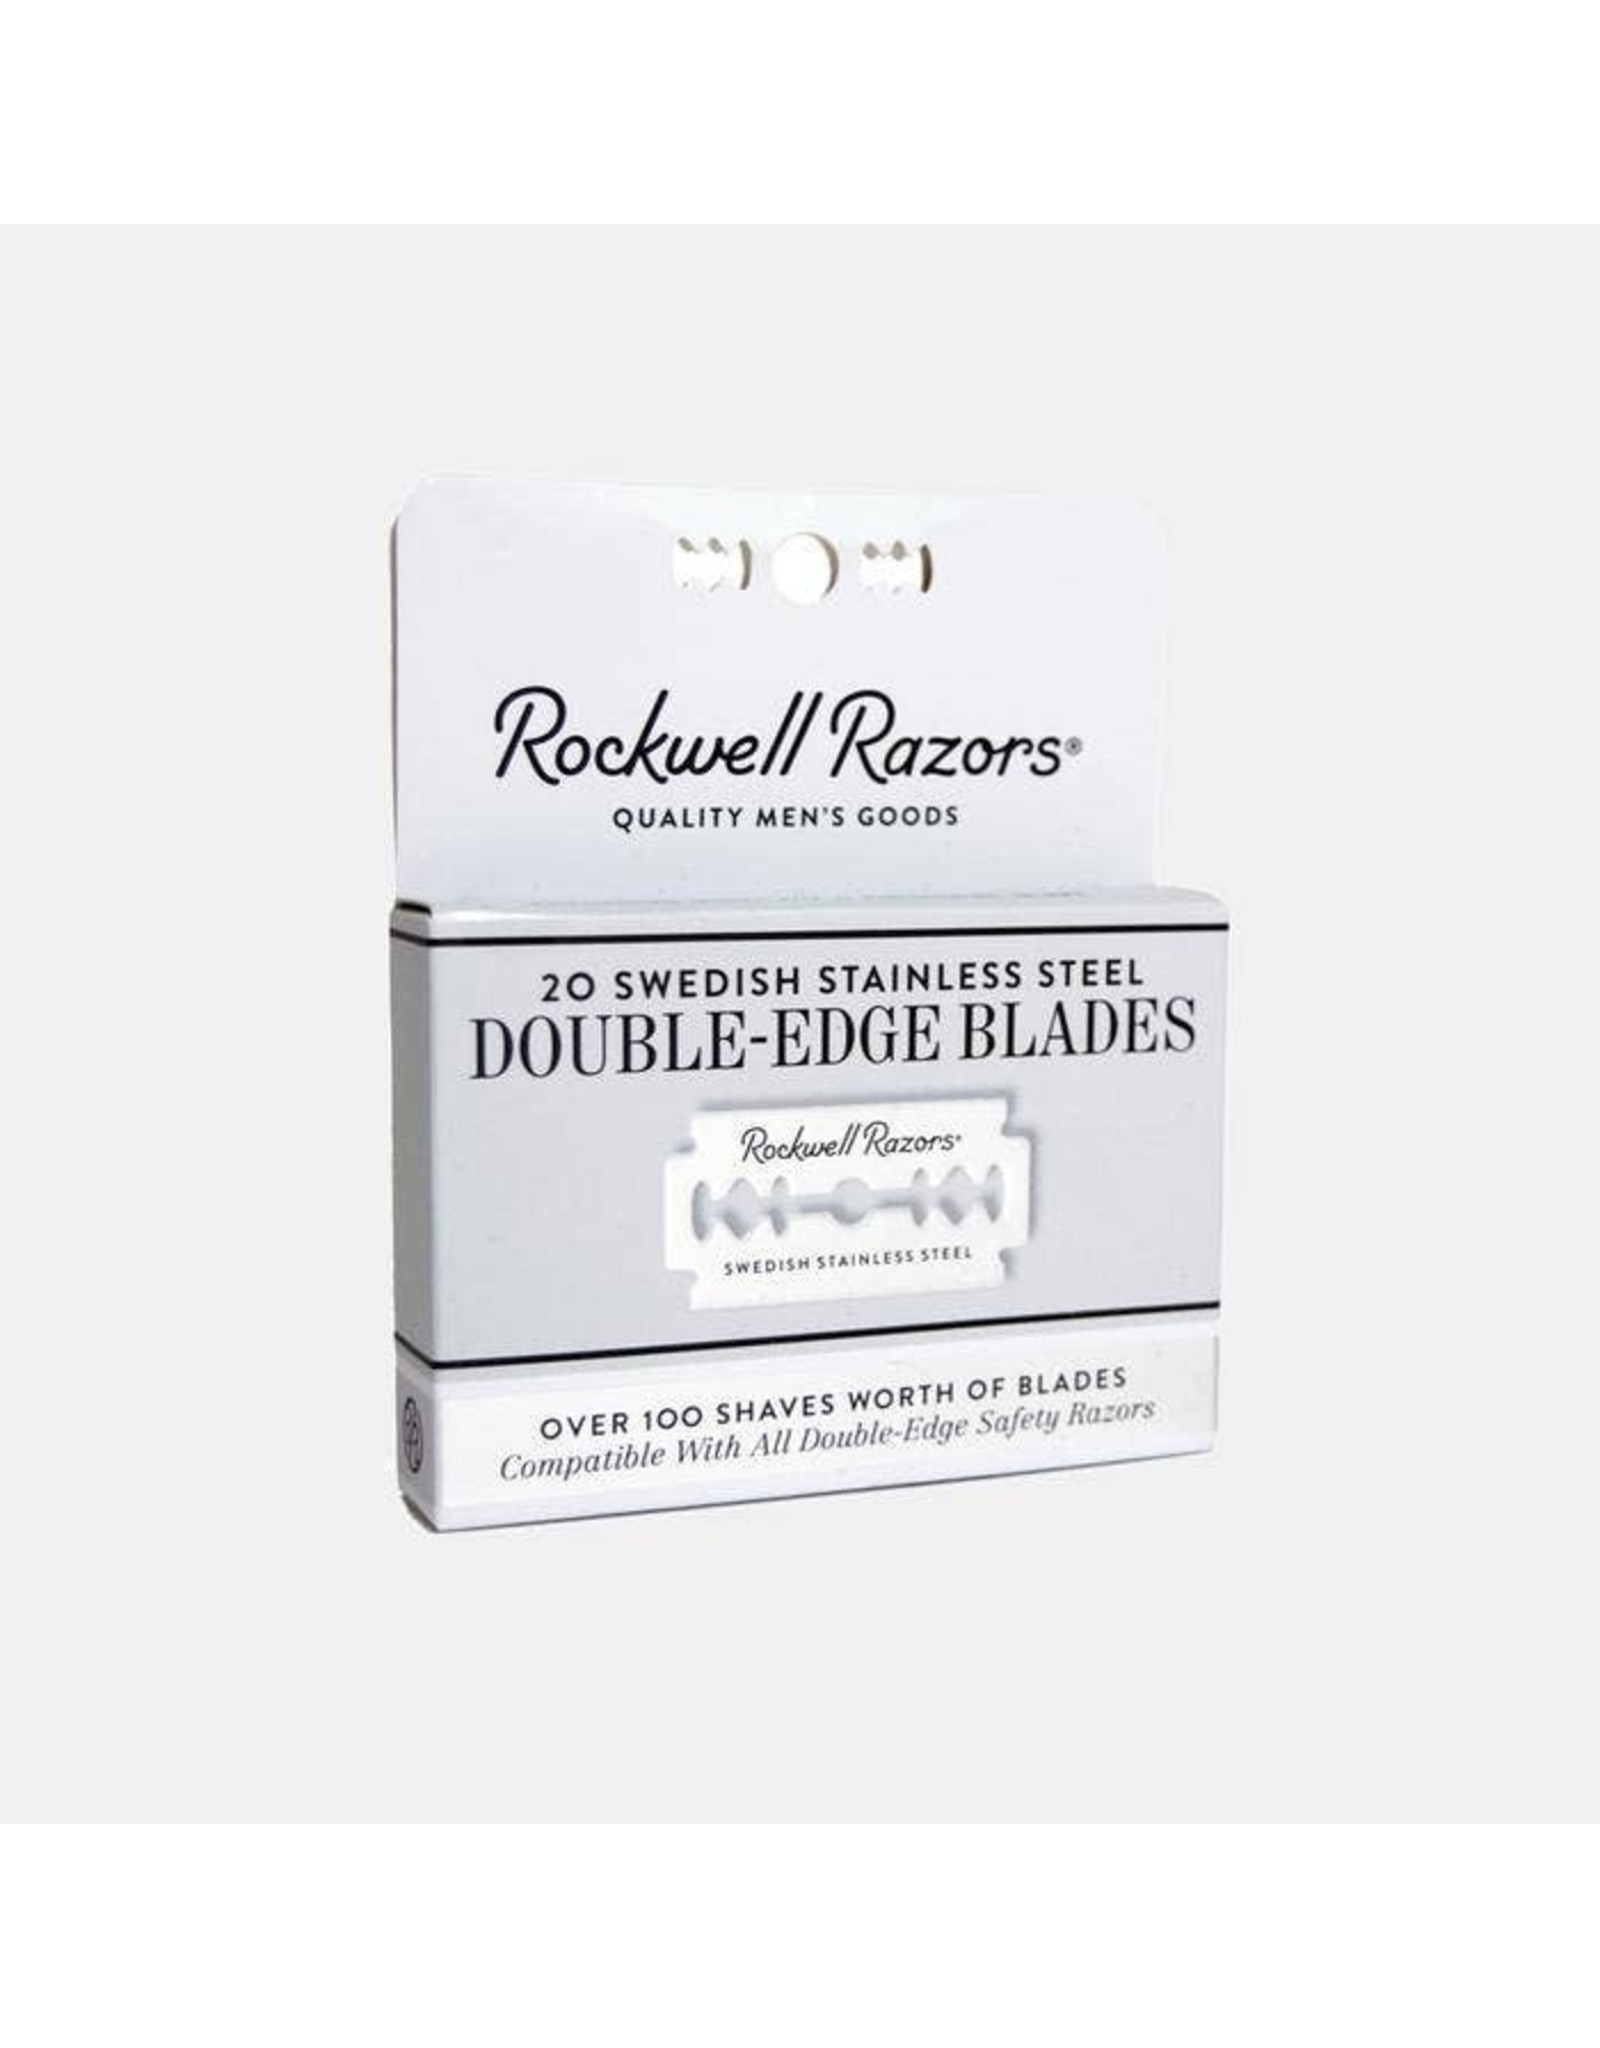 Rockwell Double Edge Razor Blades 20pk-Approximately 100 Shaves